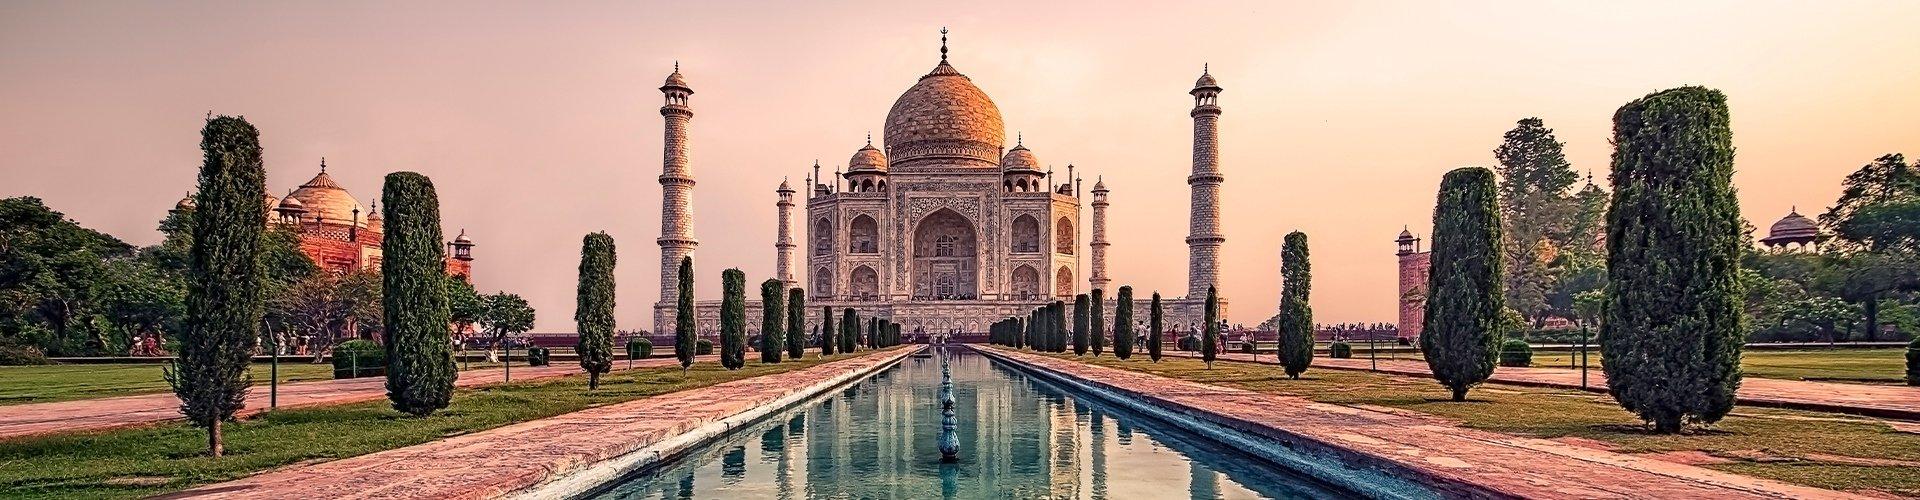 Familienurlaub in Indien